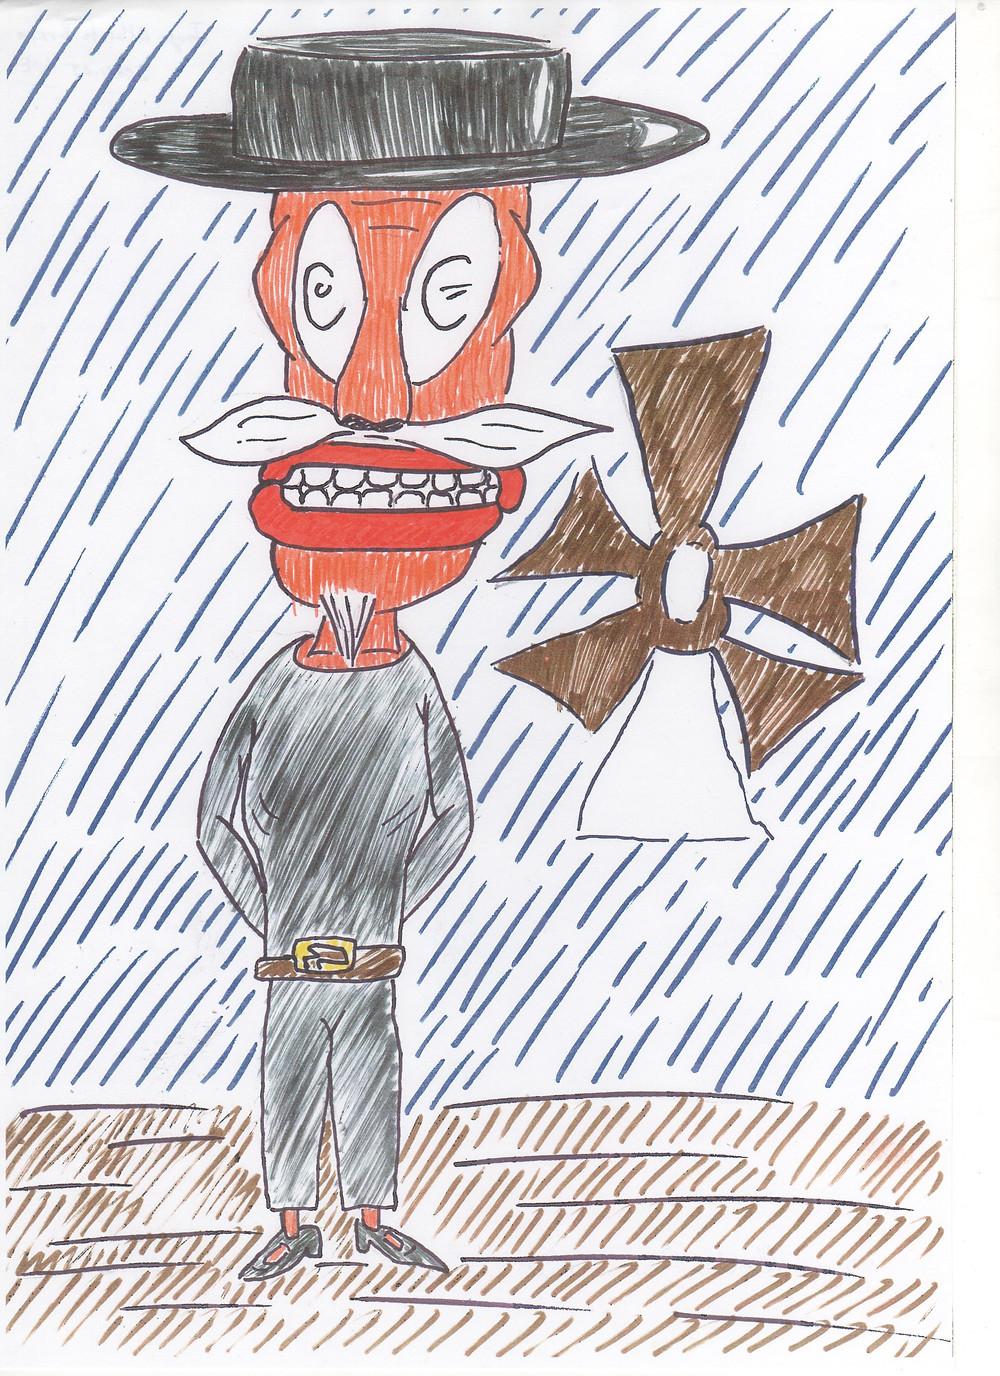 Dibujo original del alumno Jorge Alberto Bravo.